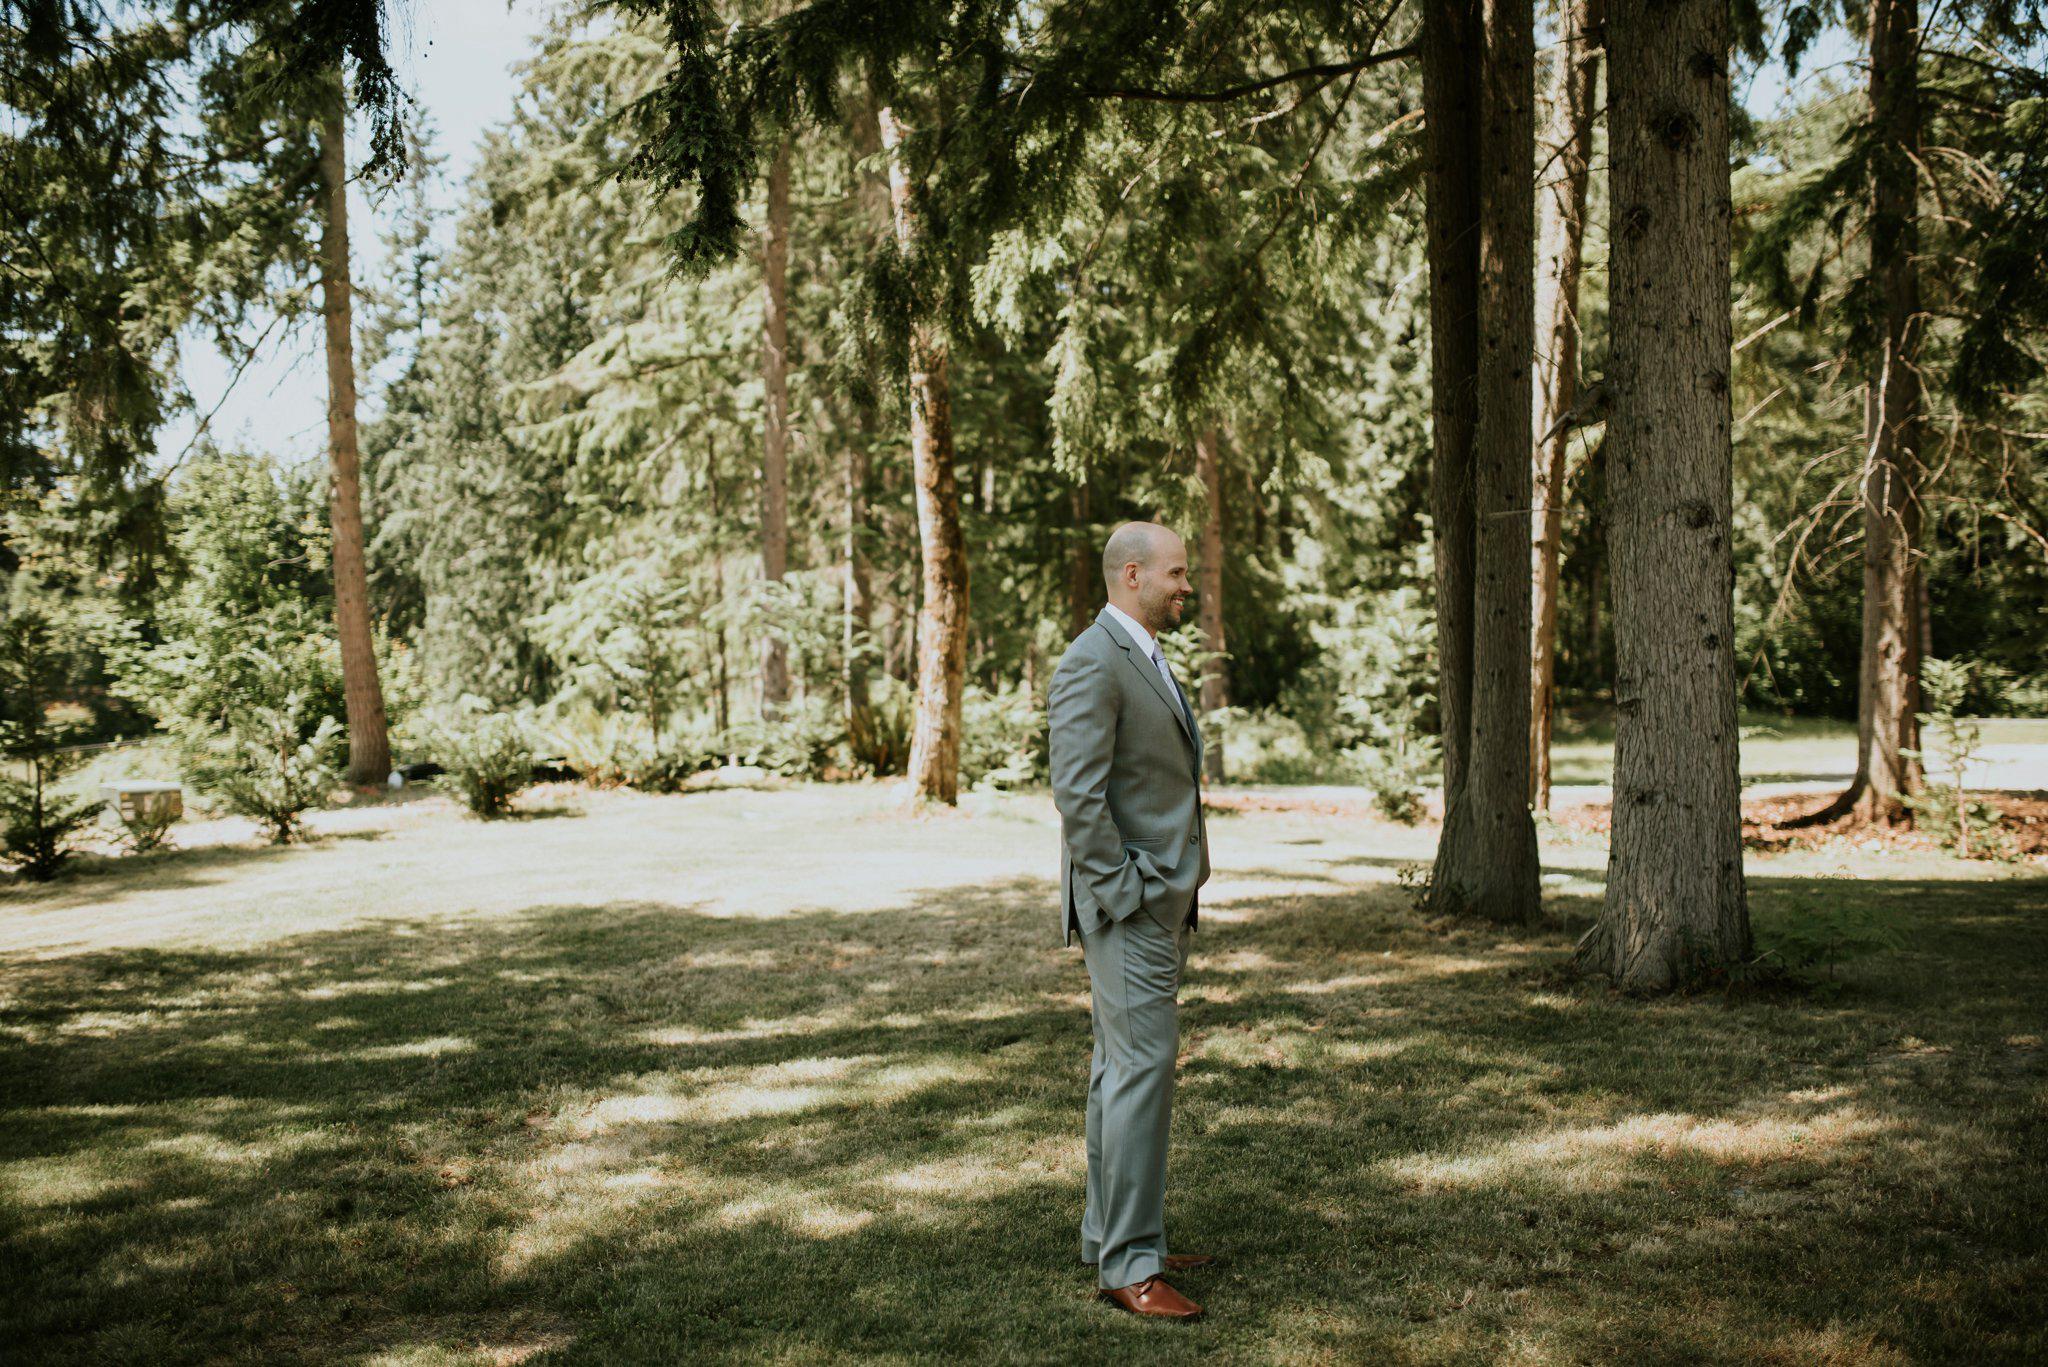 hollywood-school-house-wedding-seattle-photographer-caitlyn-nikula-31.jpg